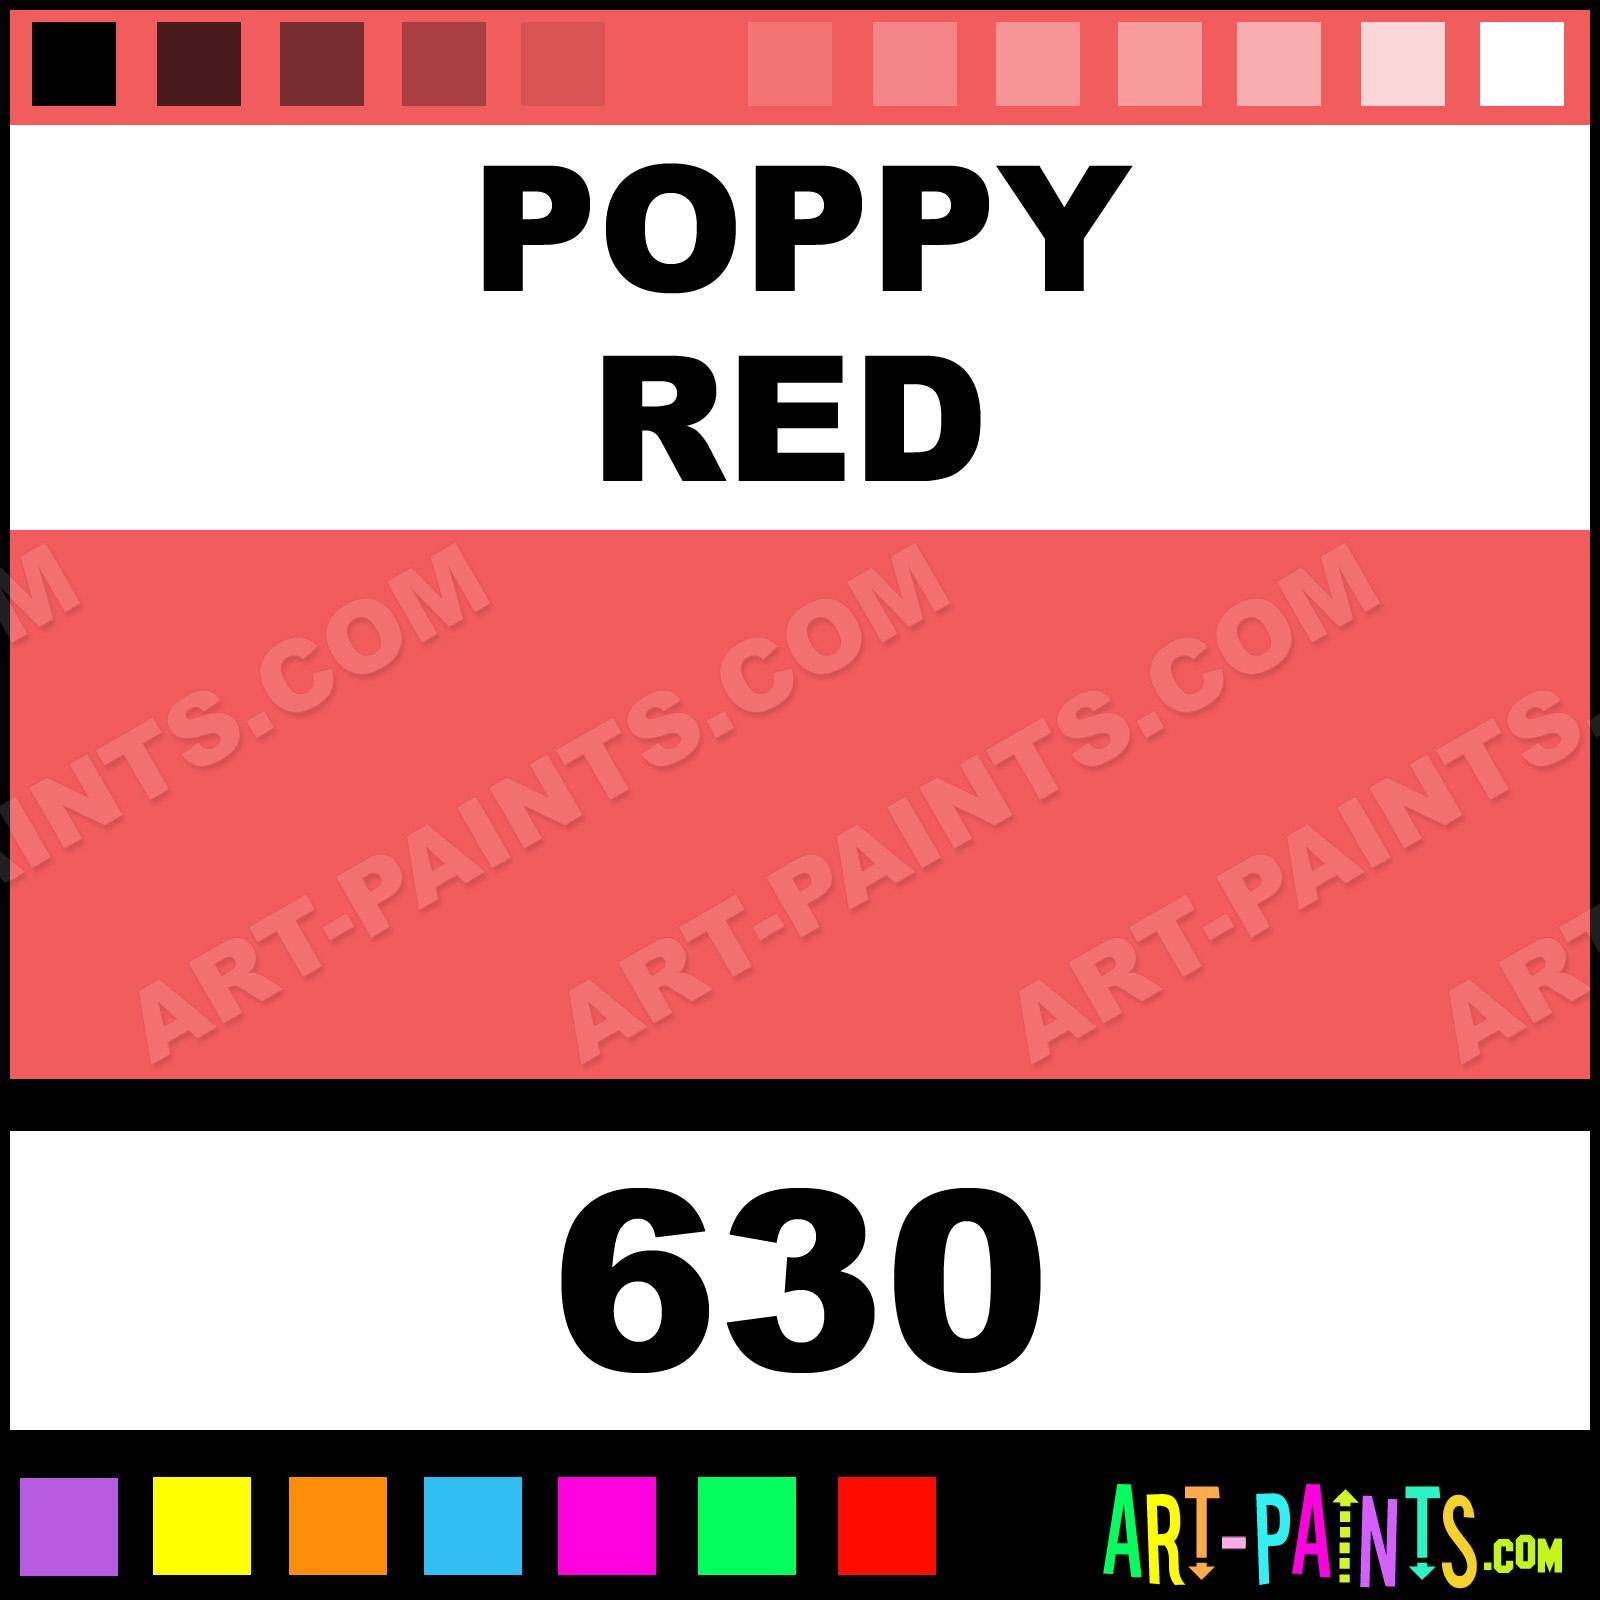 Folk art color chart acrylic paint - Poppy Red Poppy Red Paint